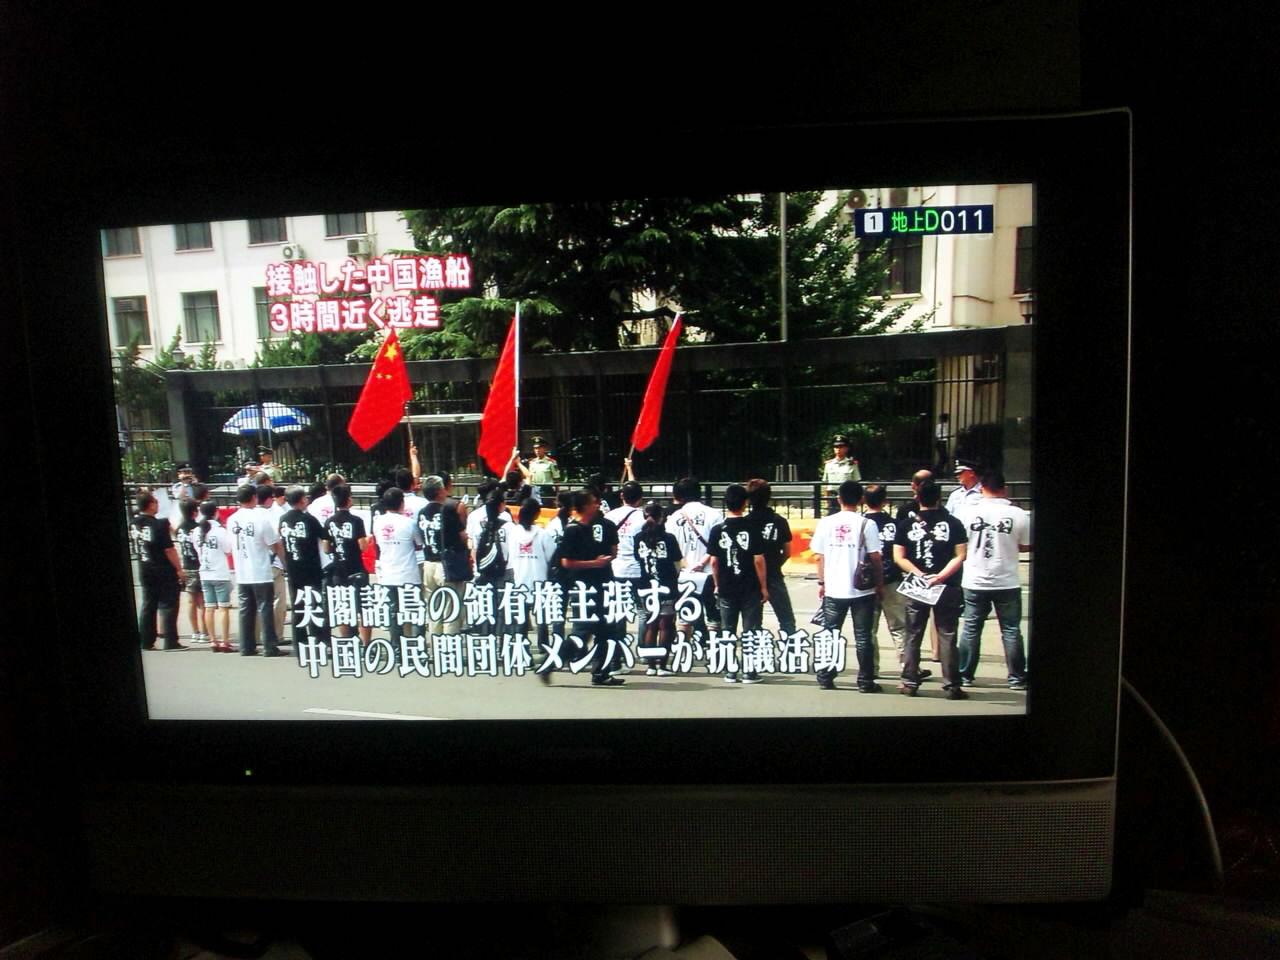 NHKテレビ 北京での抗議活動を報道_d0027795_19224478.jpg